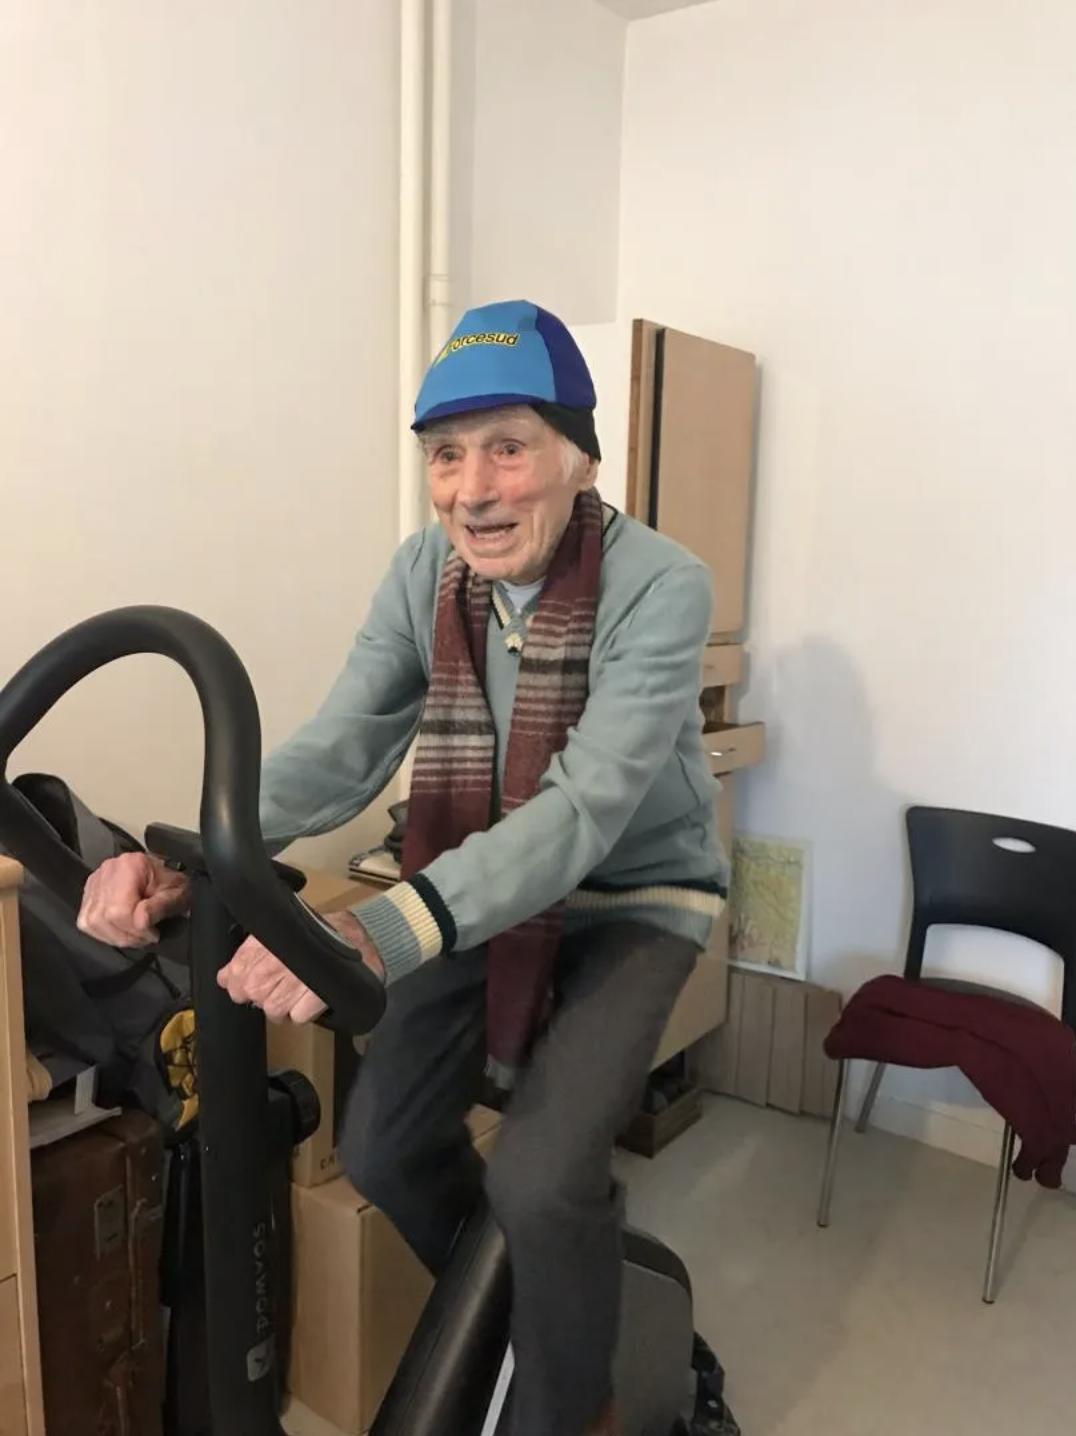 Robert Marchand on his exercise bike